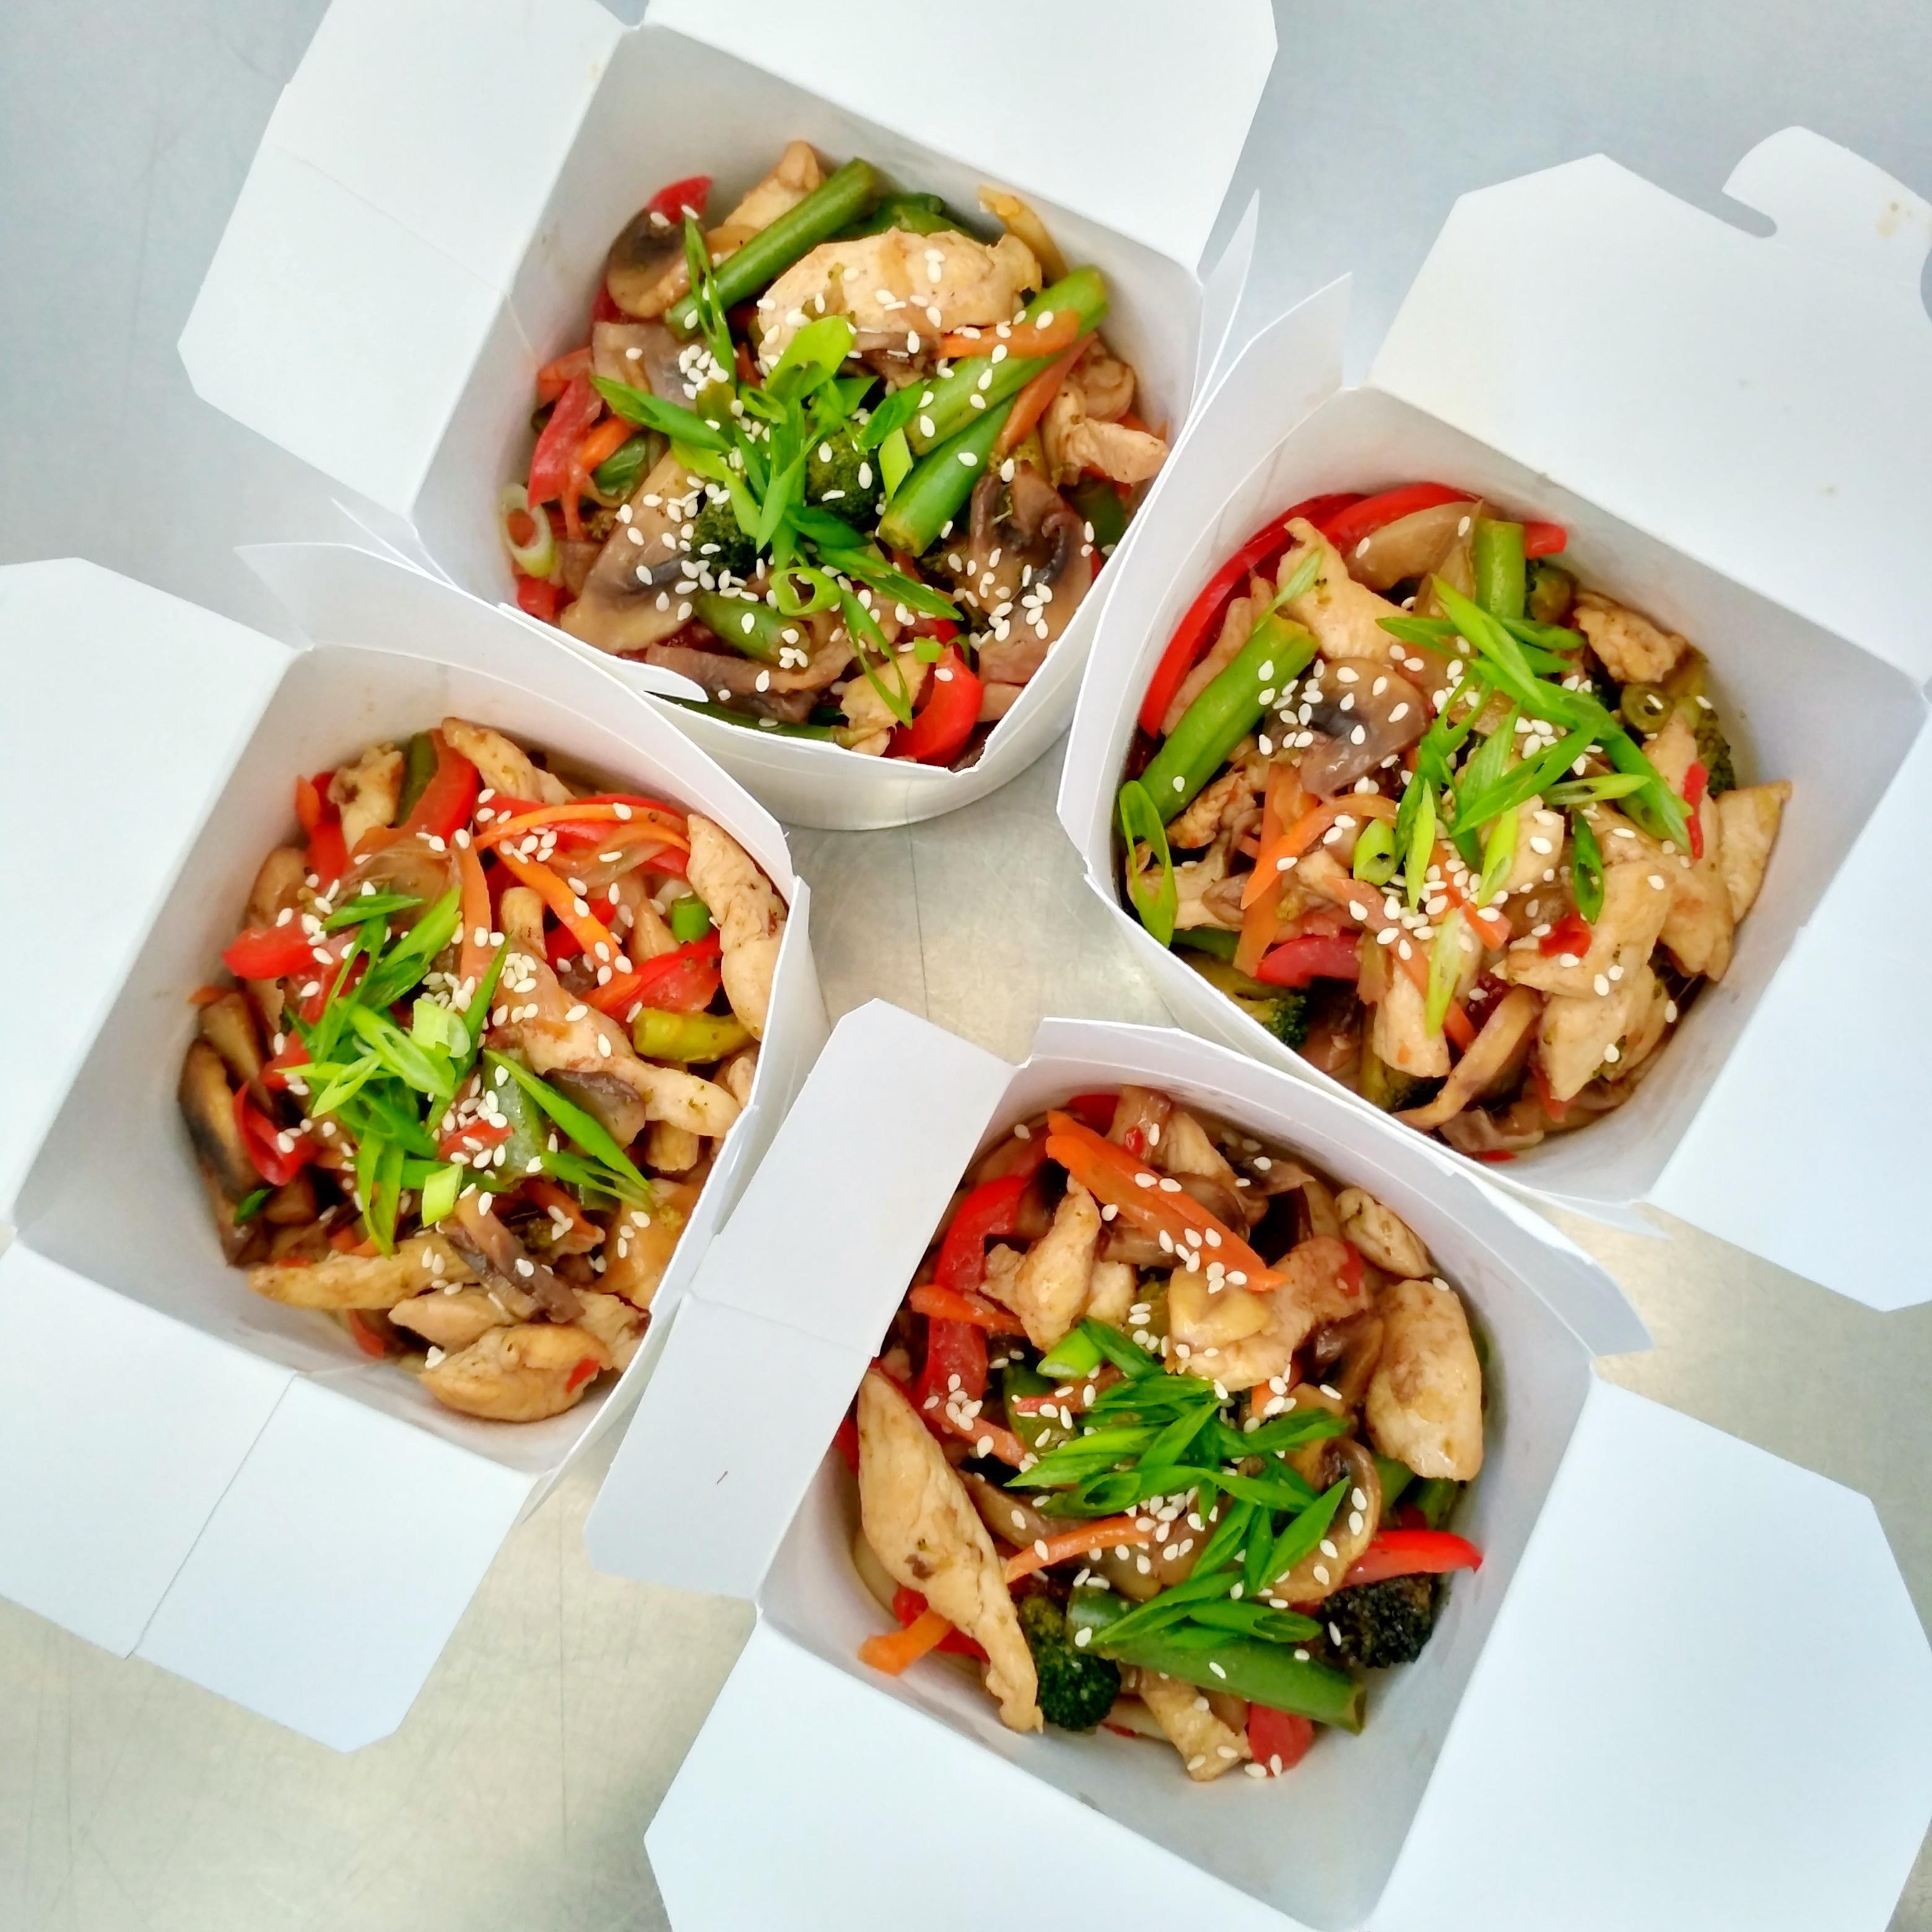 Лапша по-тайски с курицей или морепродуктамиот 150 рублей